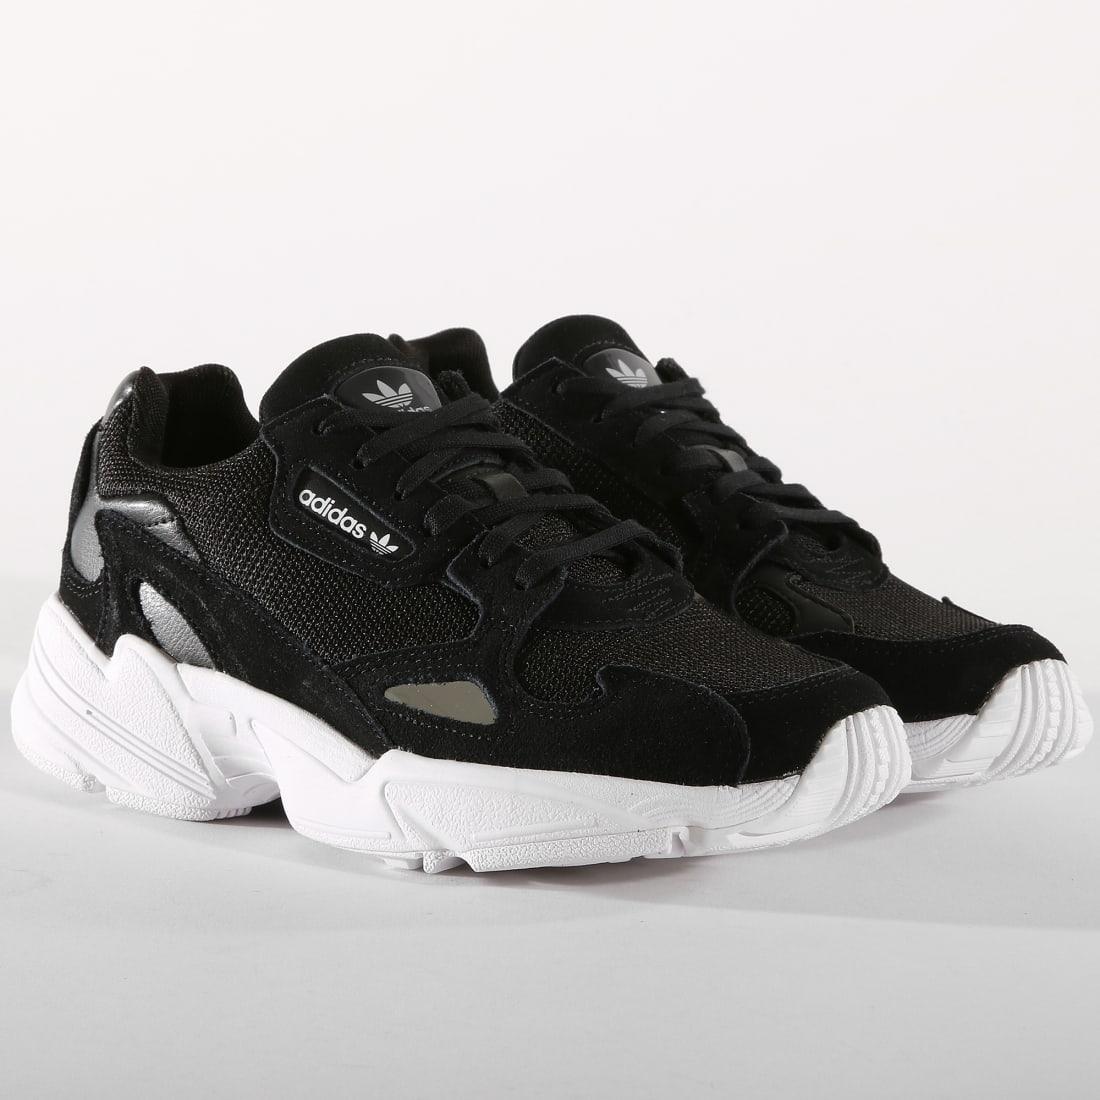 adidas Baskets Falcon B28129 Core Black Footwear White